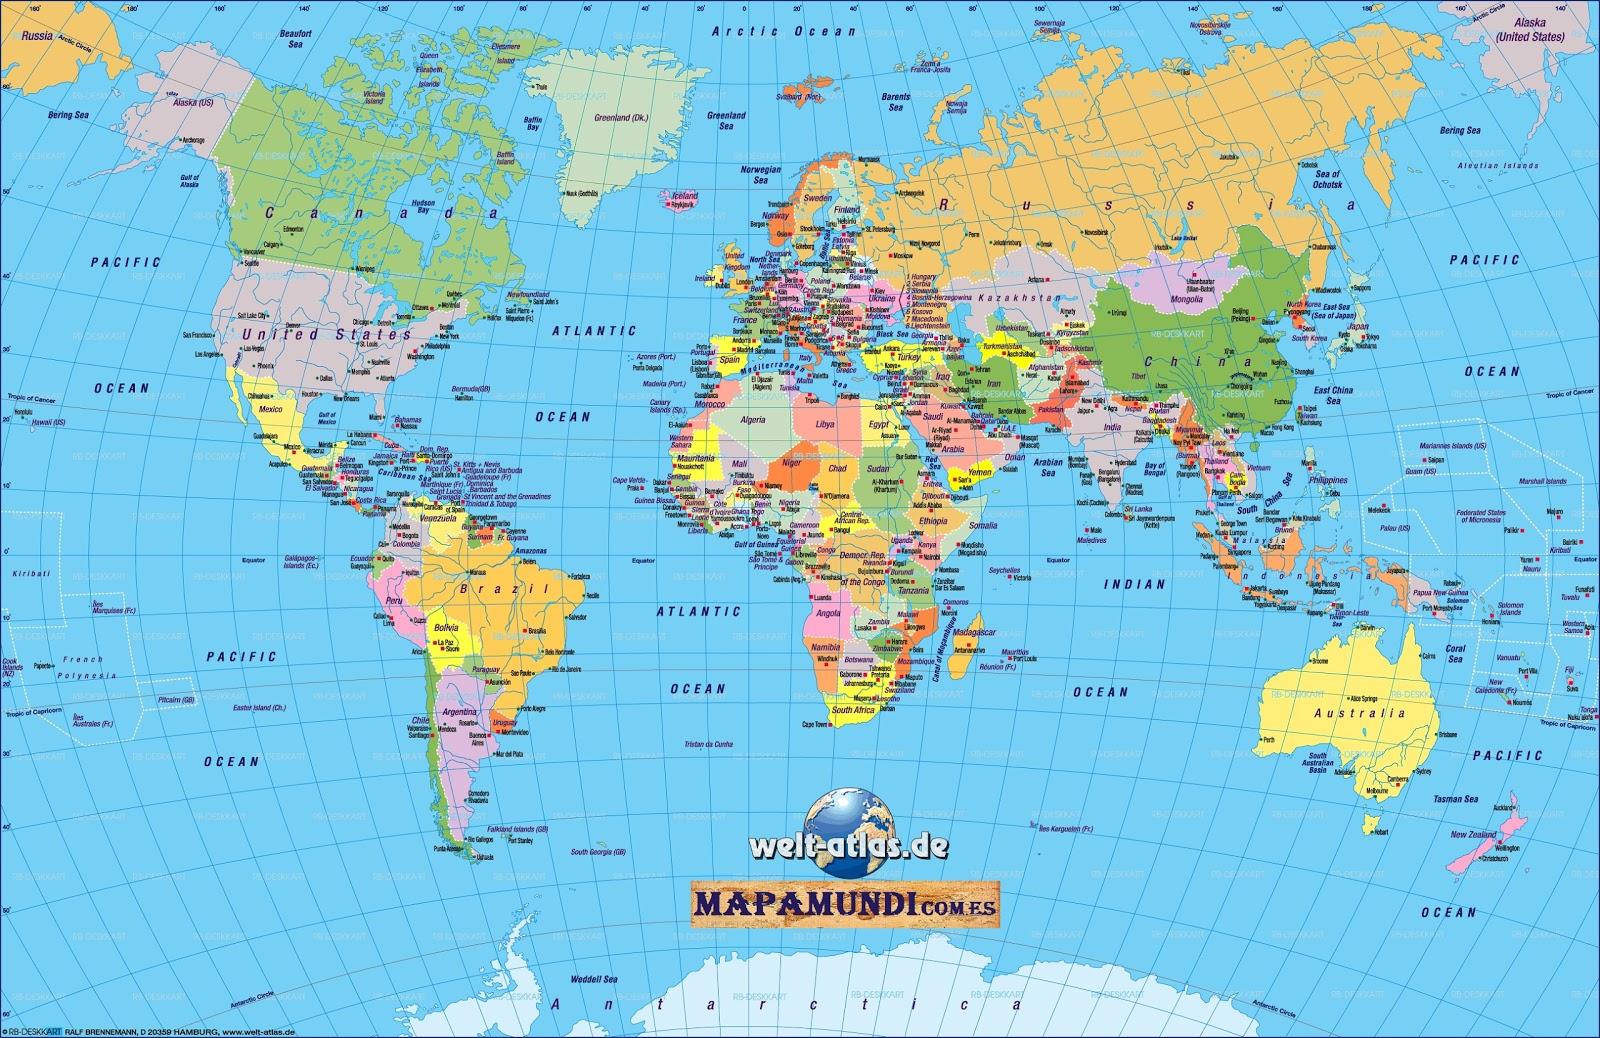 Puerto Rico Mapa Mundi.Mapamundi Mapas Del Mundo Y Mucho Mas Mapamundi Mapa